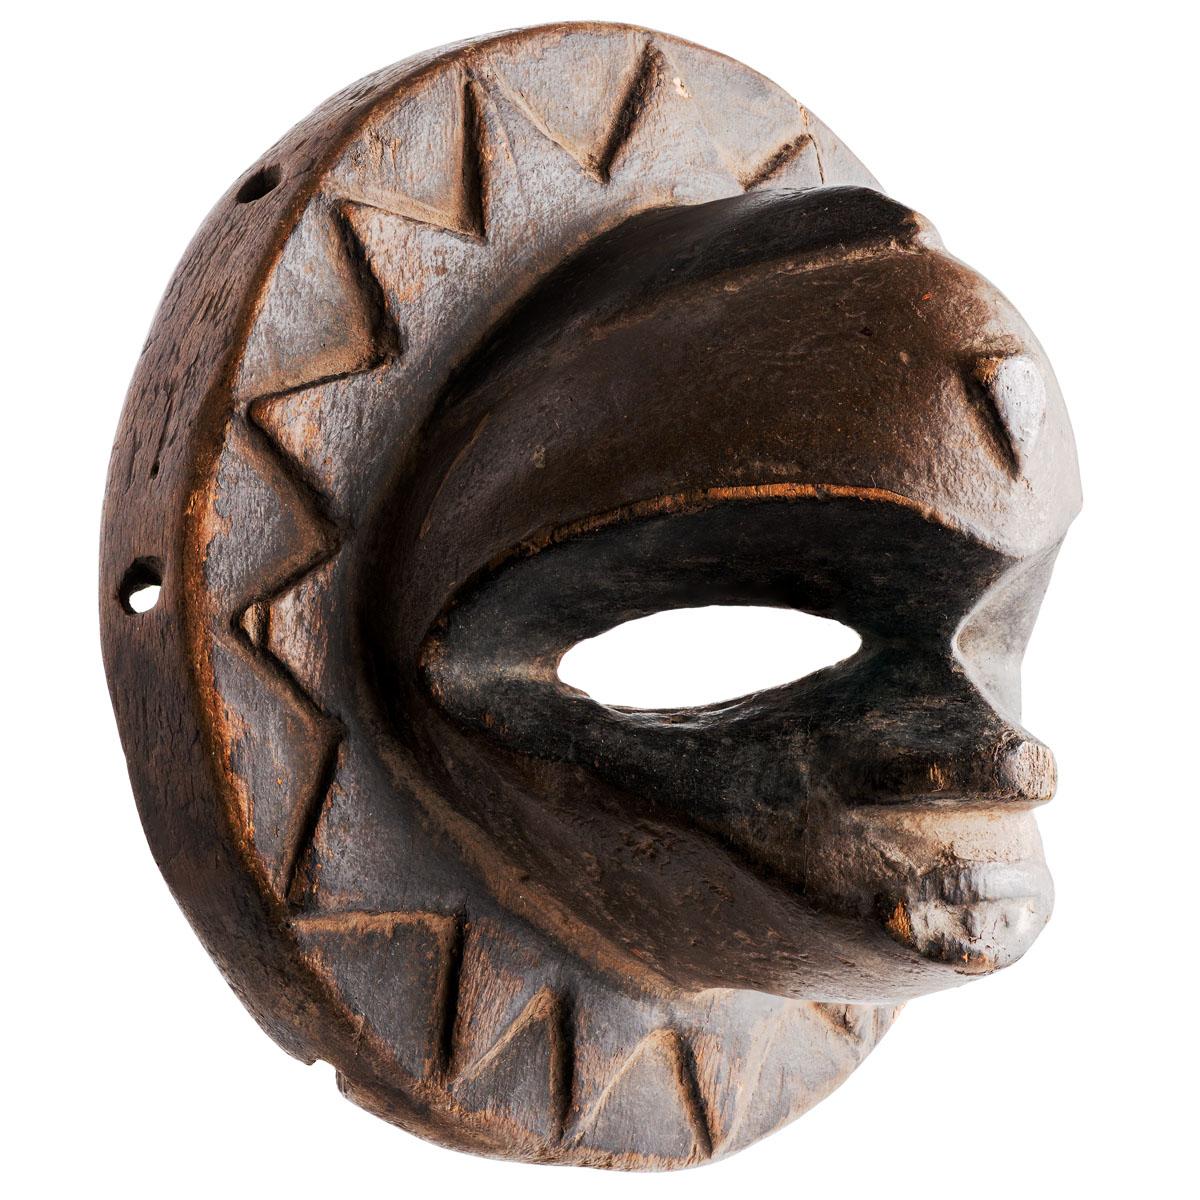 Eket Mask, Cameroon